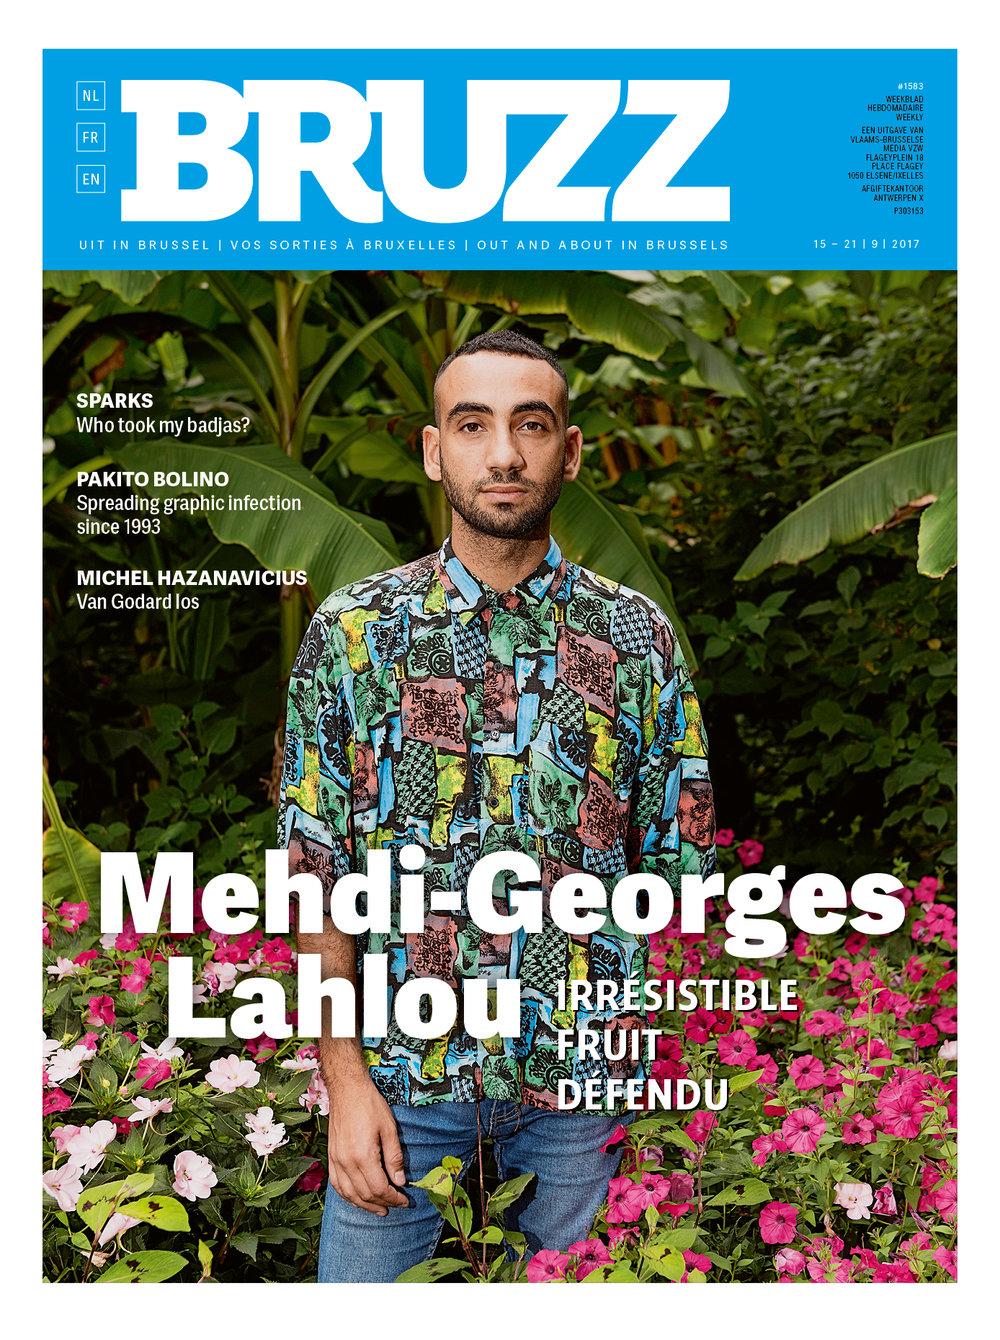 Mehdi-Georges Lahlou couverture.jpg